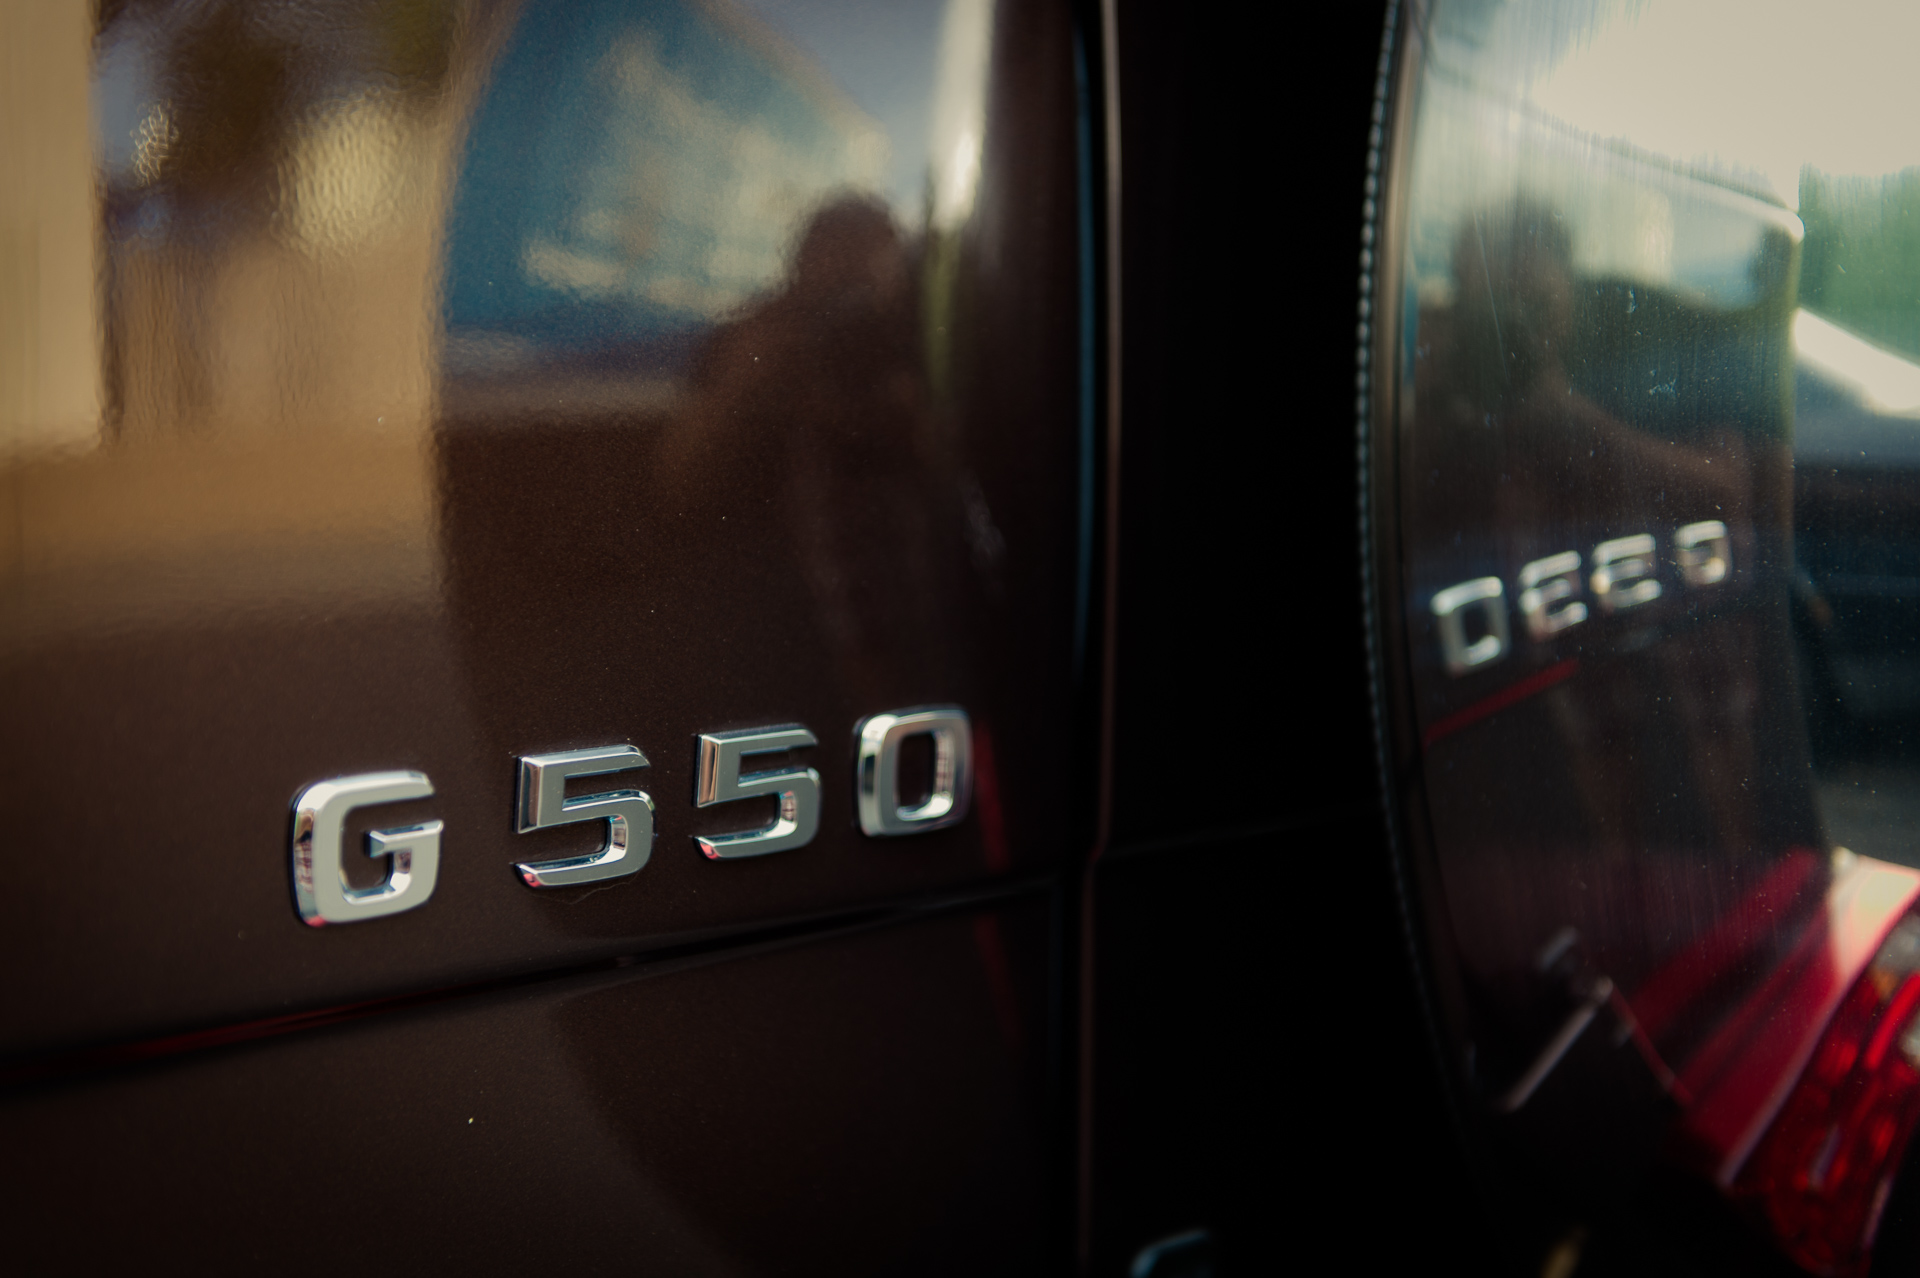 2014-Mercedes-Benz-G500-G550-braun-Kalifornien-mbrt14-32